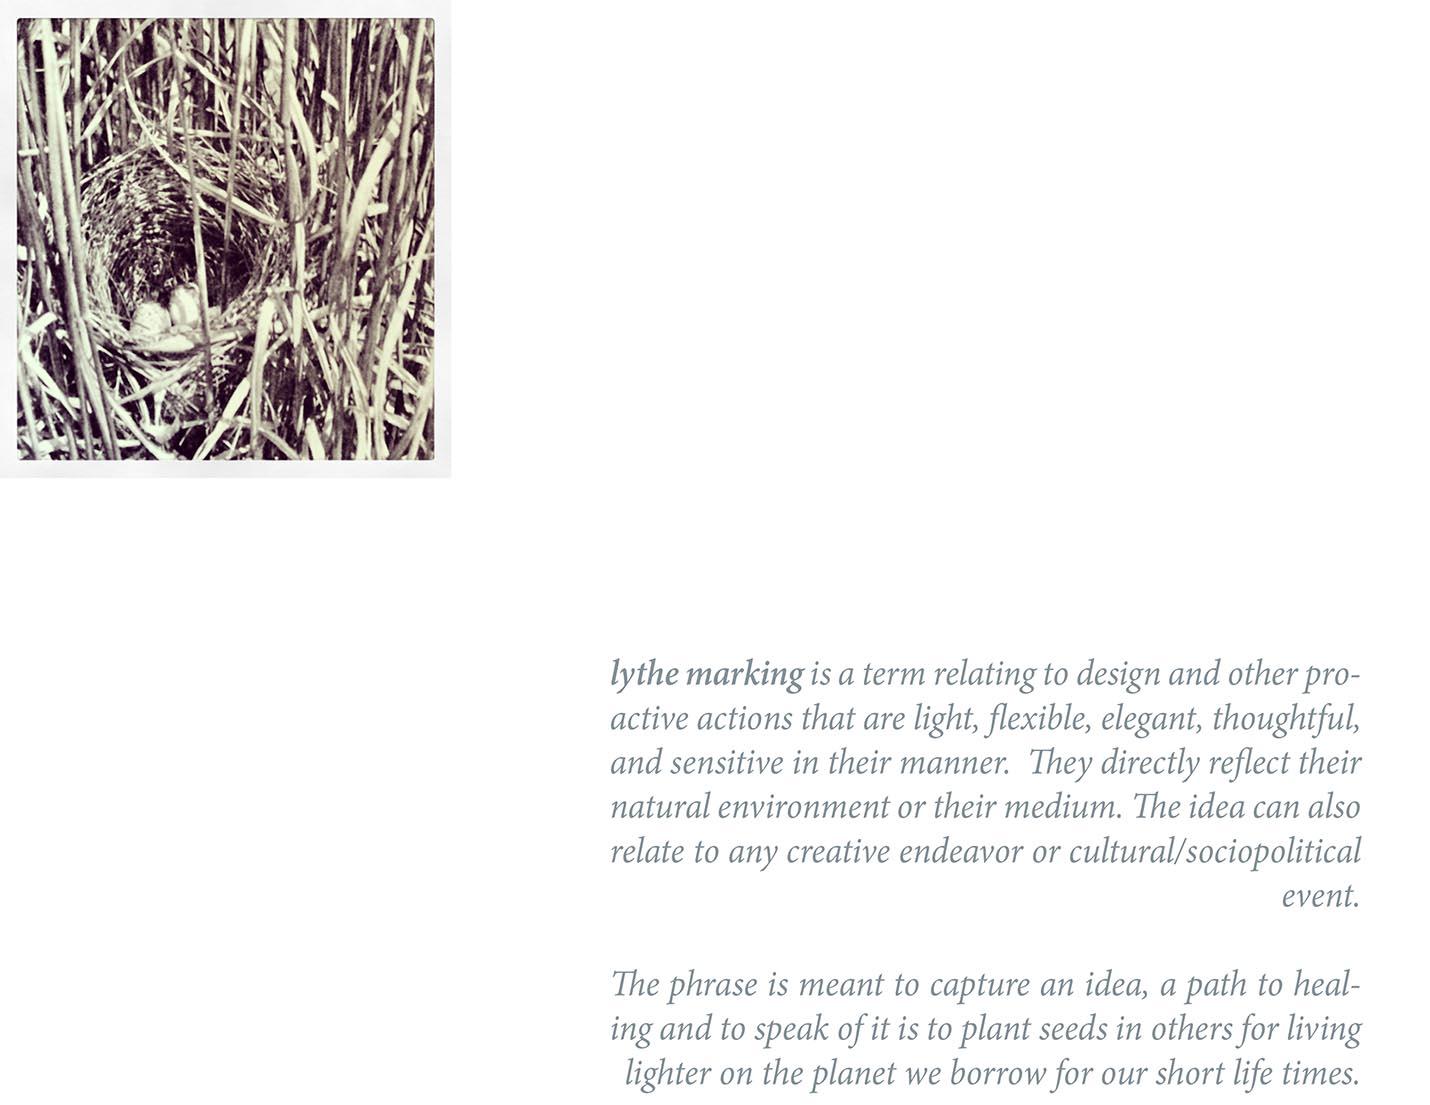 lythe marking copy-5.jpg